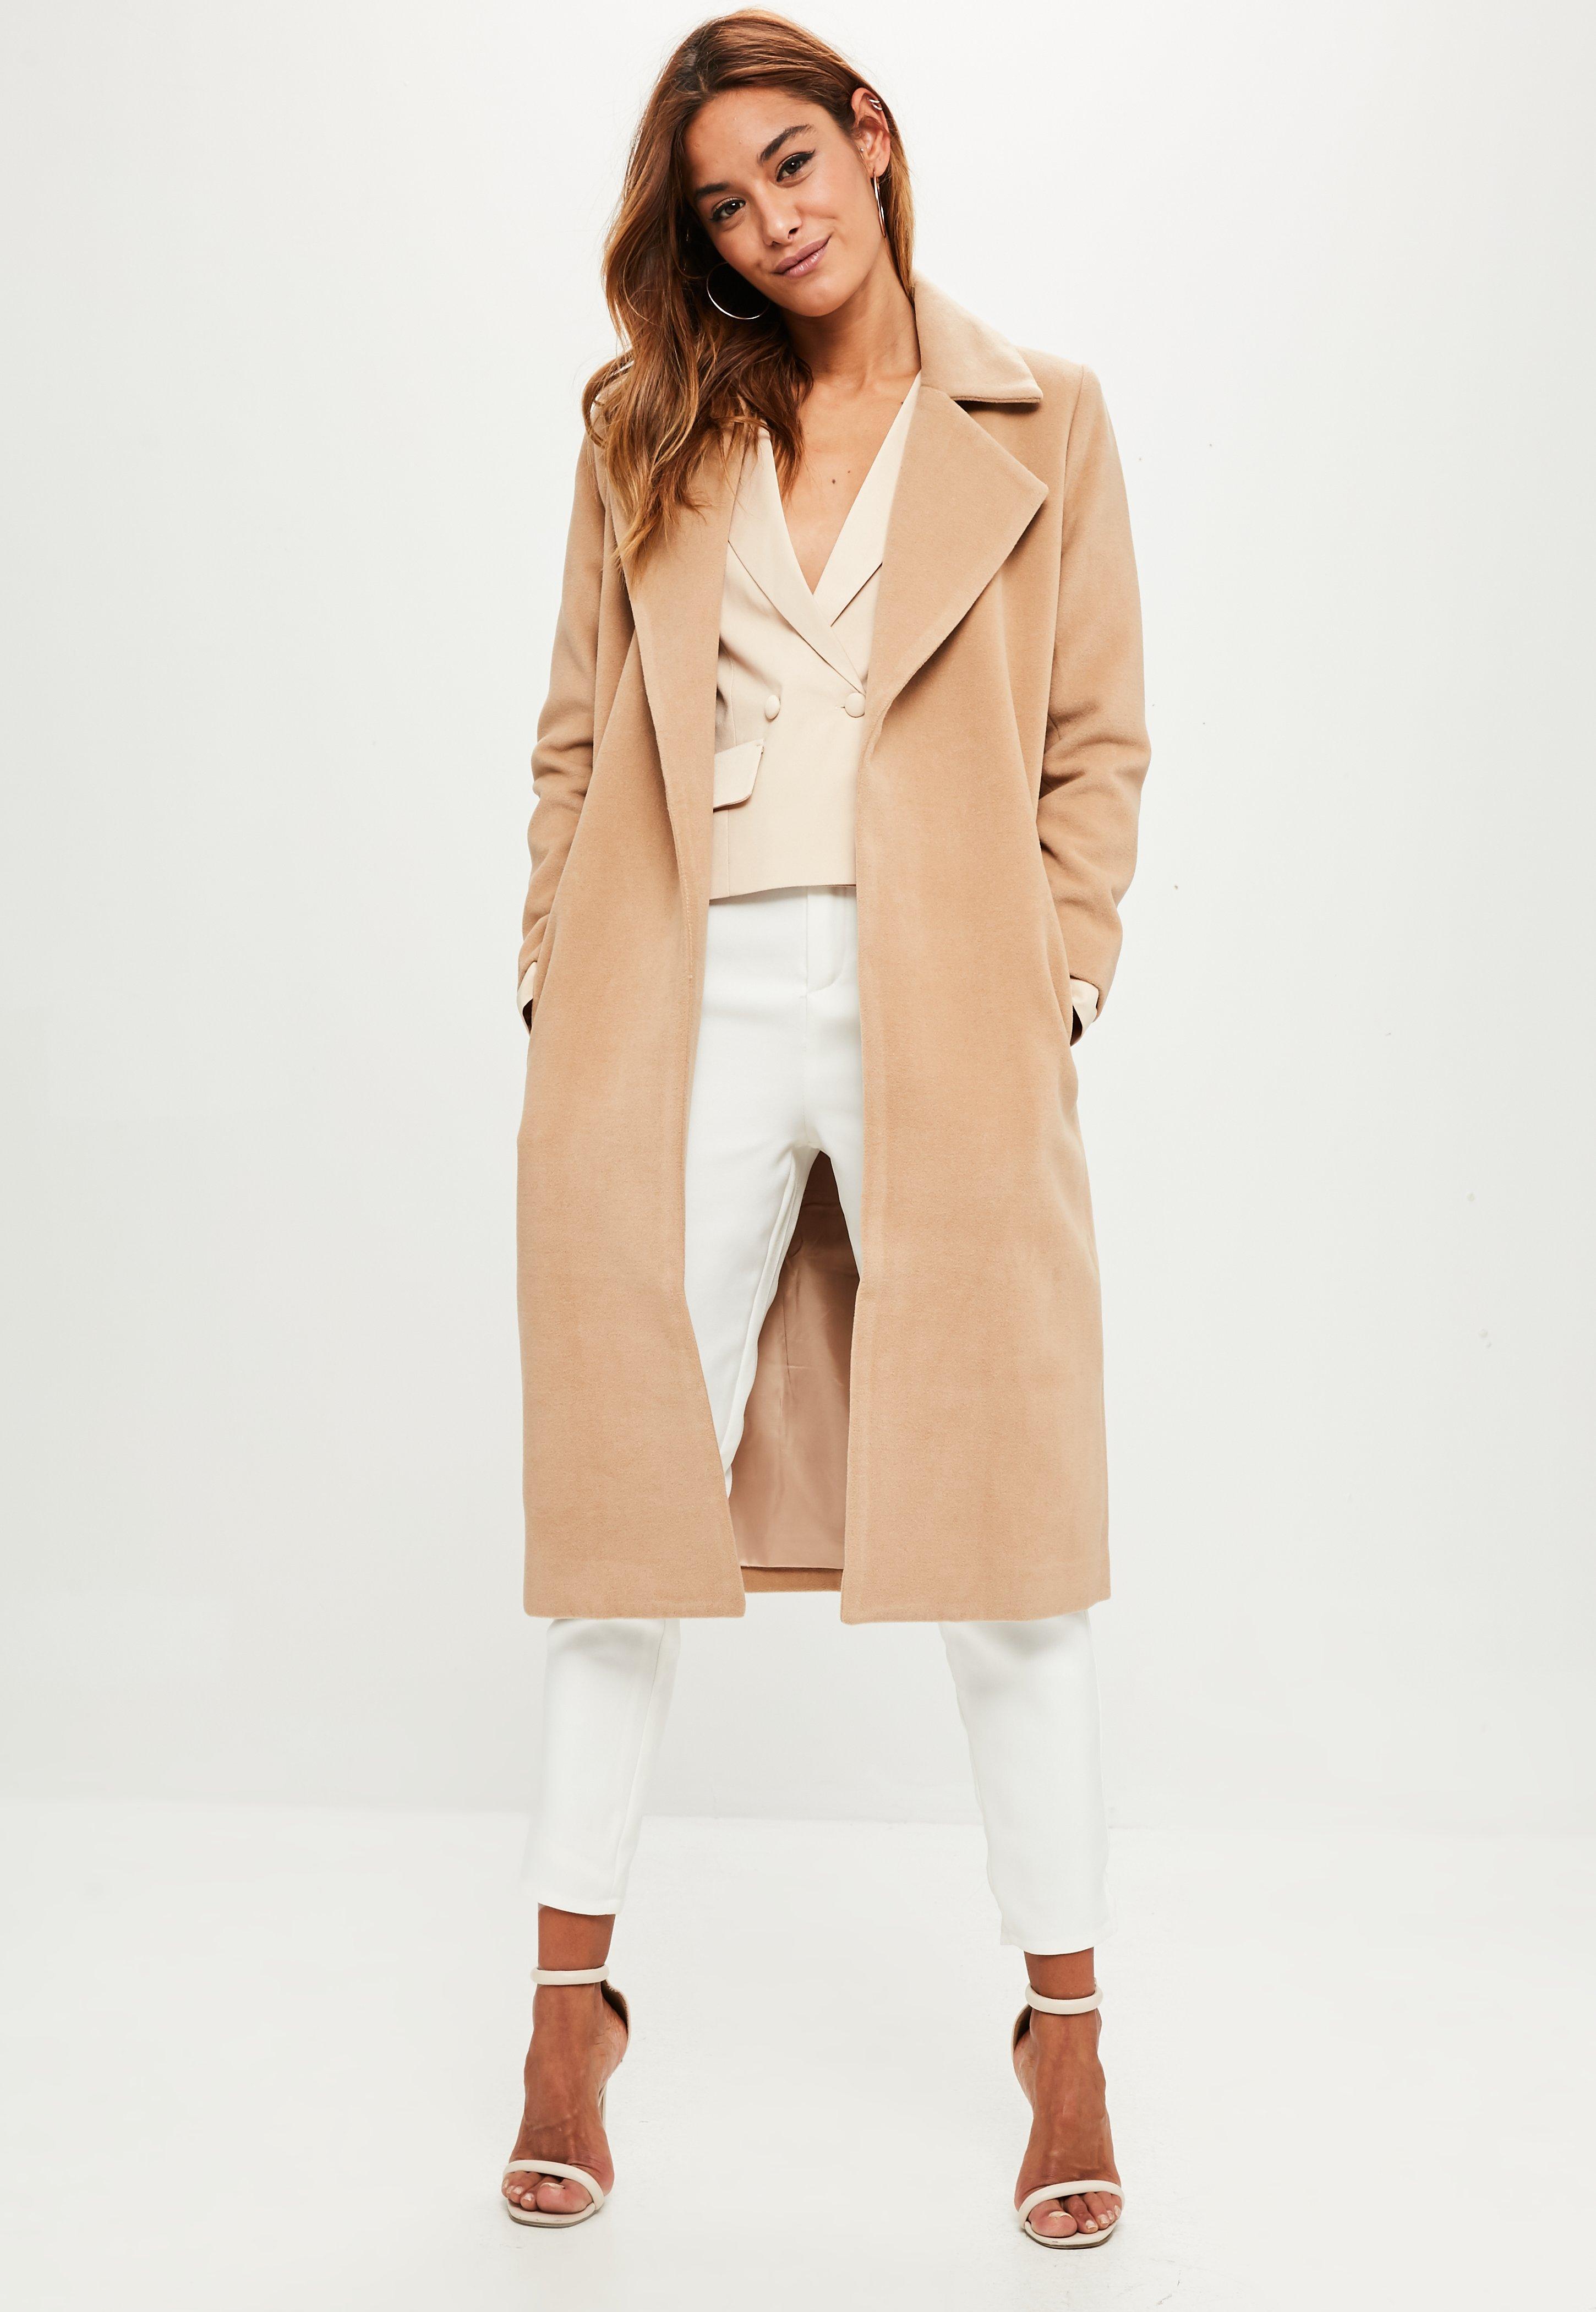 Manteau camel femme petite